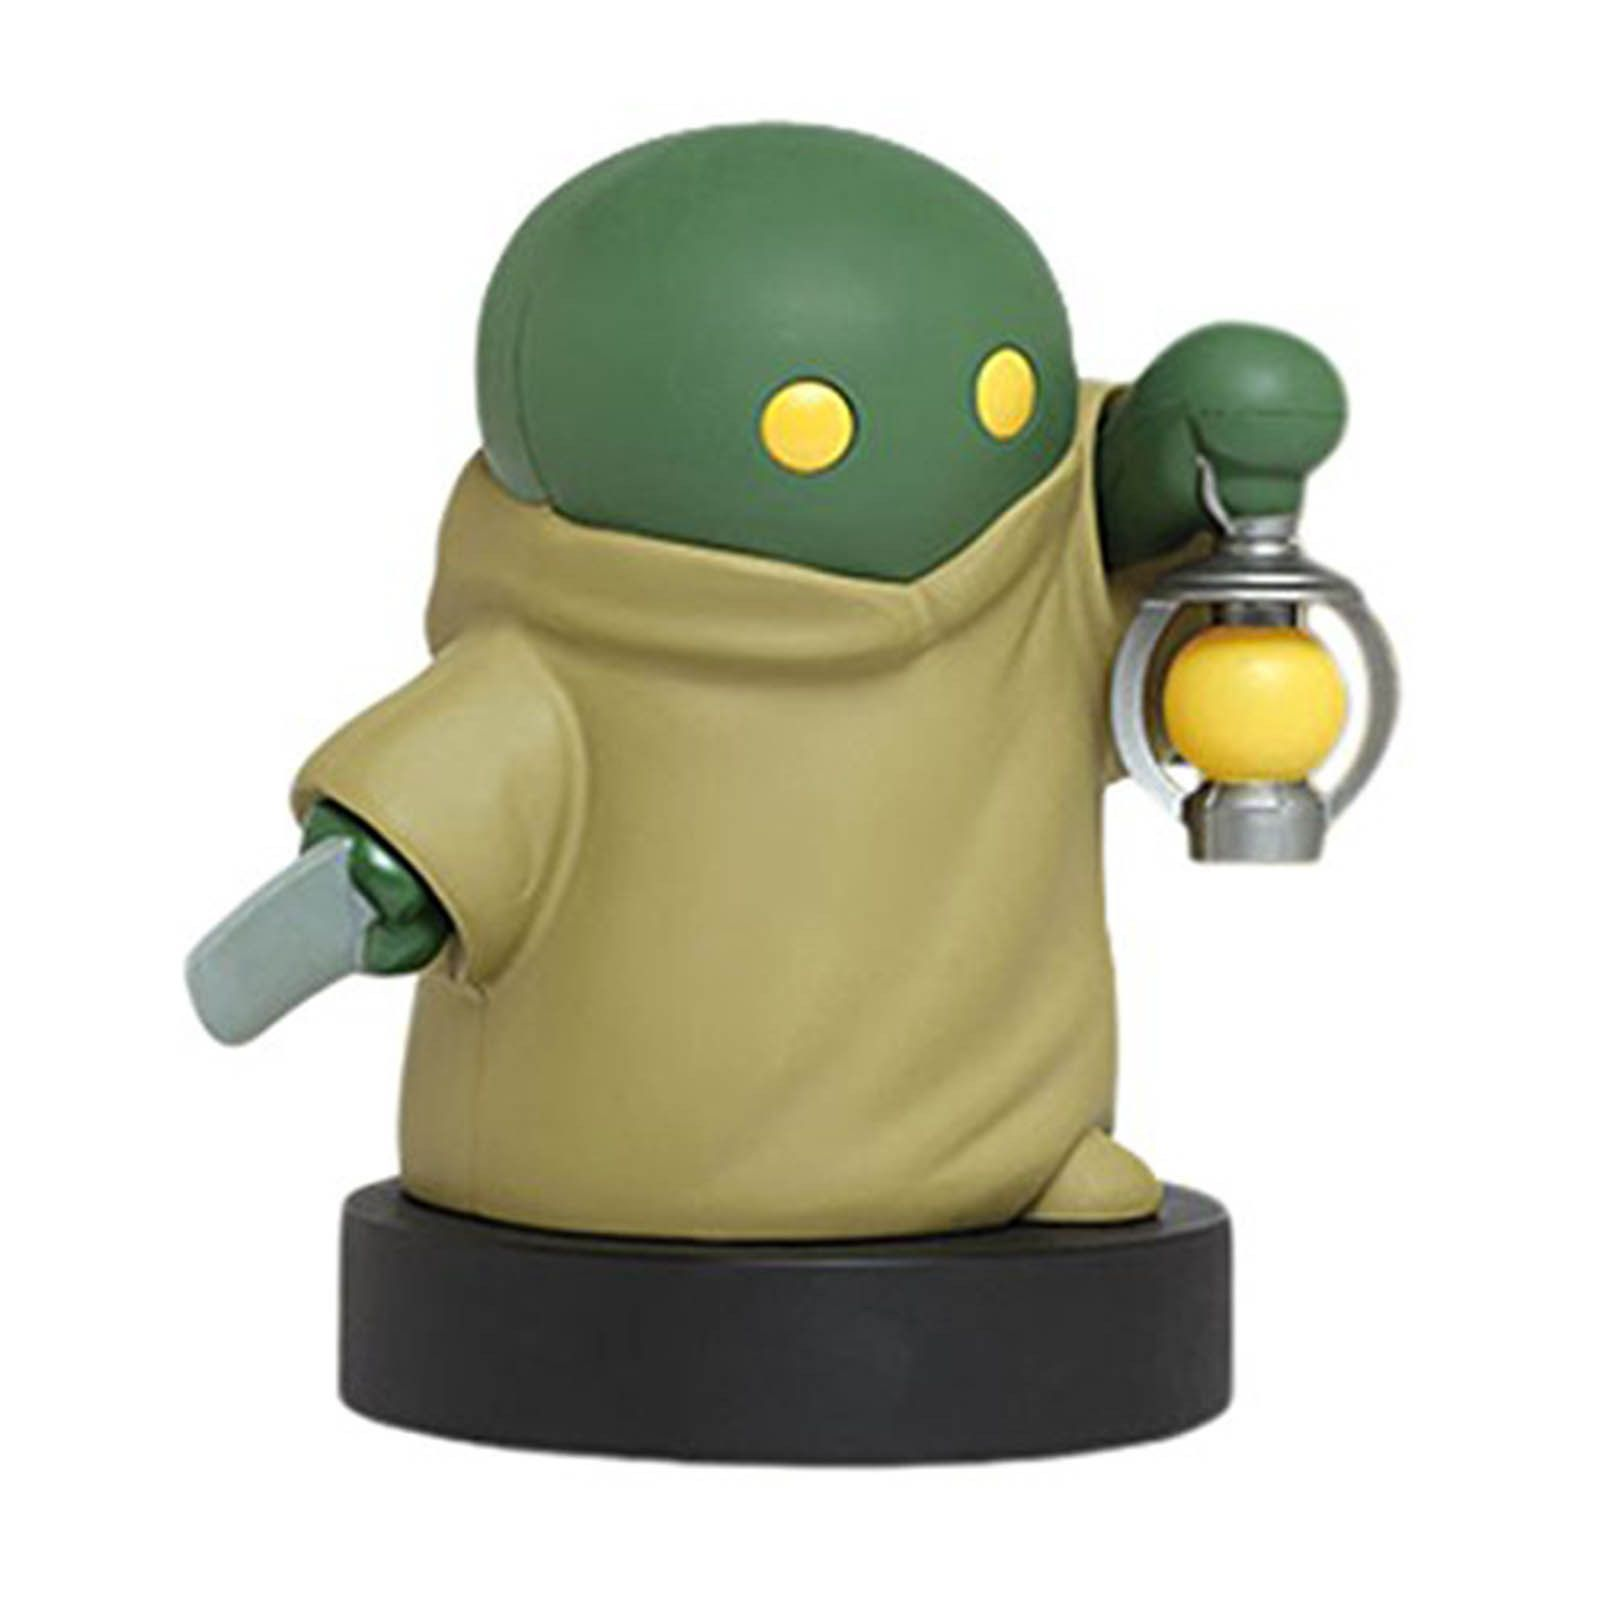 Final Fantasy XIV Volume 1 Minion Ifrit Mini Figure - Radar Toys ...